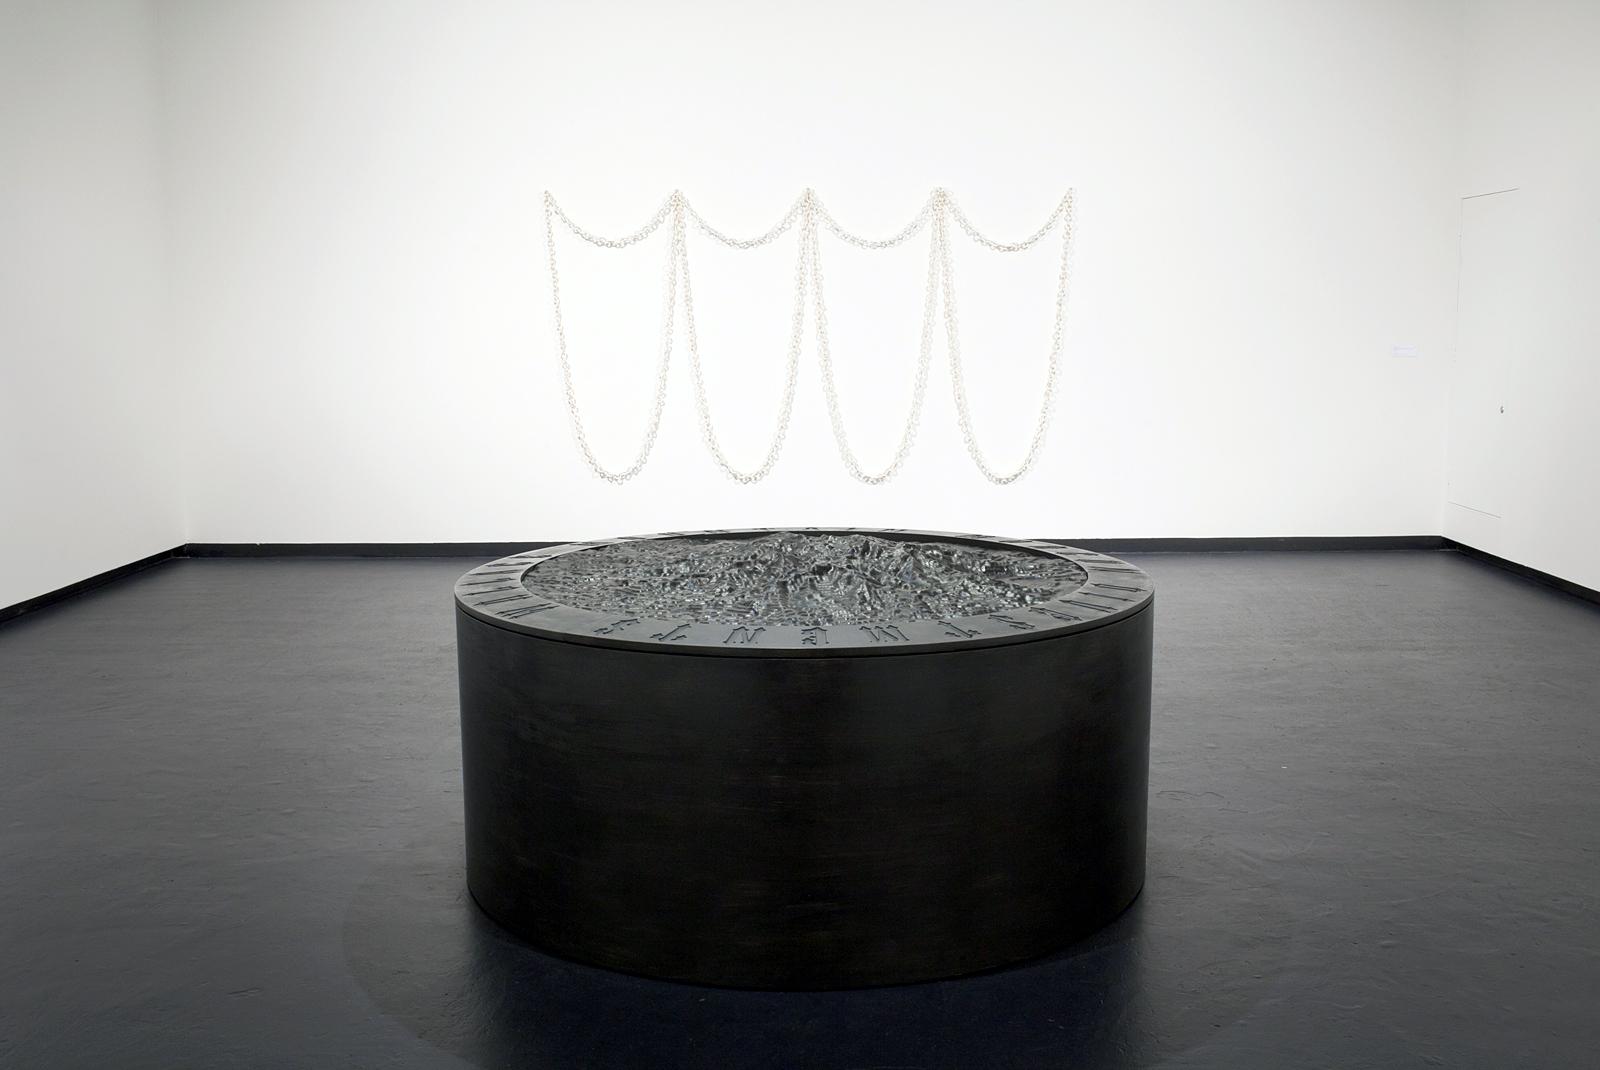 Ringfence, sculpture by New Zealand artist Brett Graham